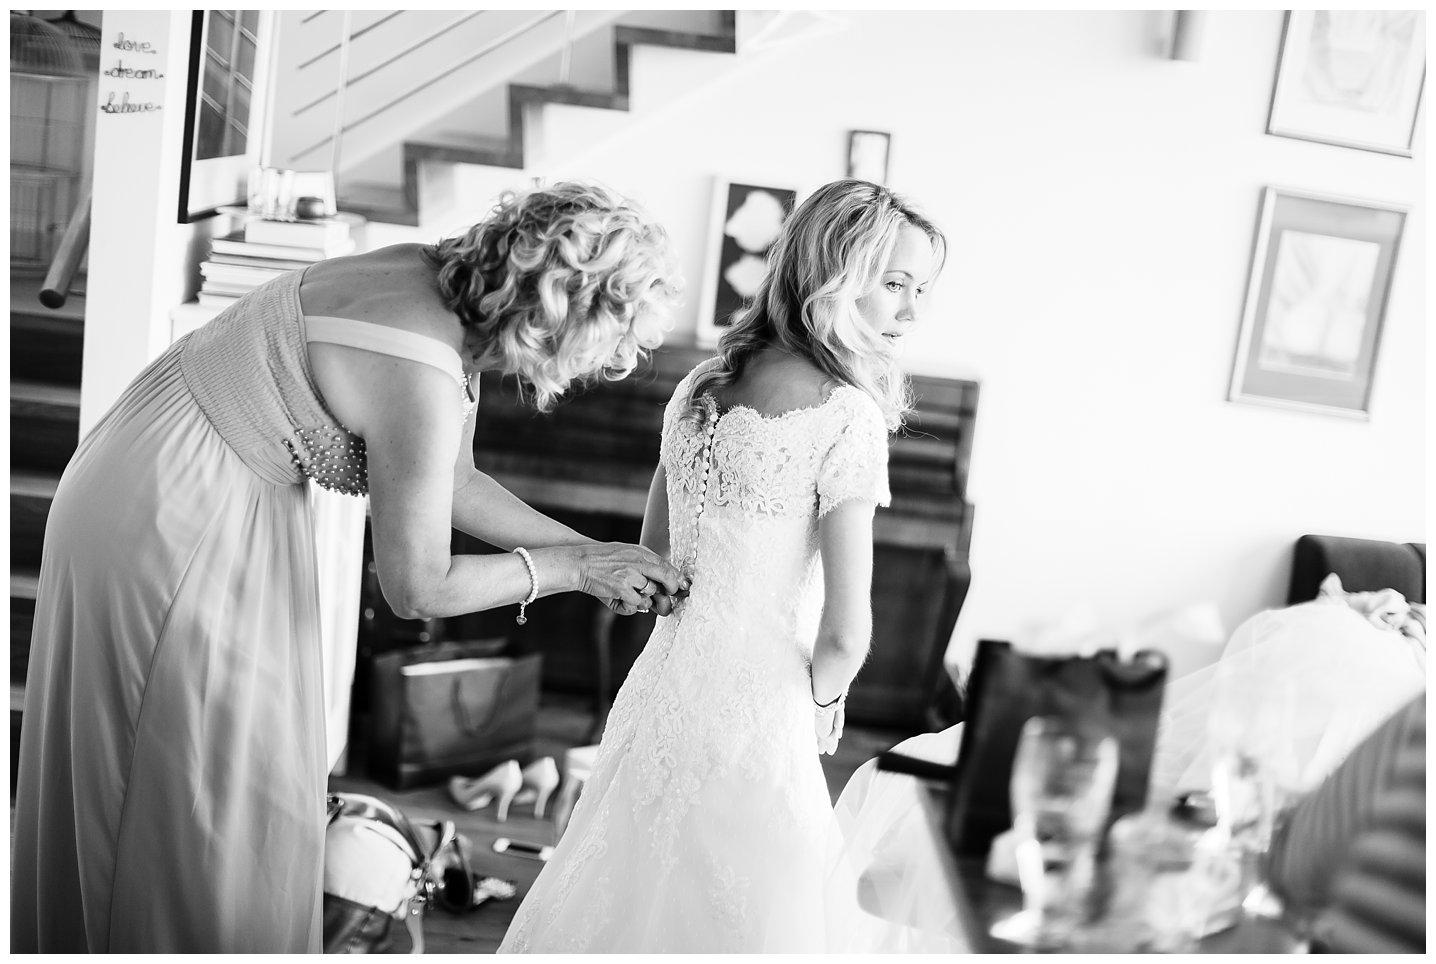 Fotograf-Eline-Jacobine-Bryllup-Villa-Malla-Camilla-og-Alexander_0036